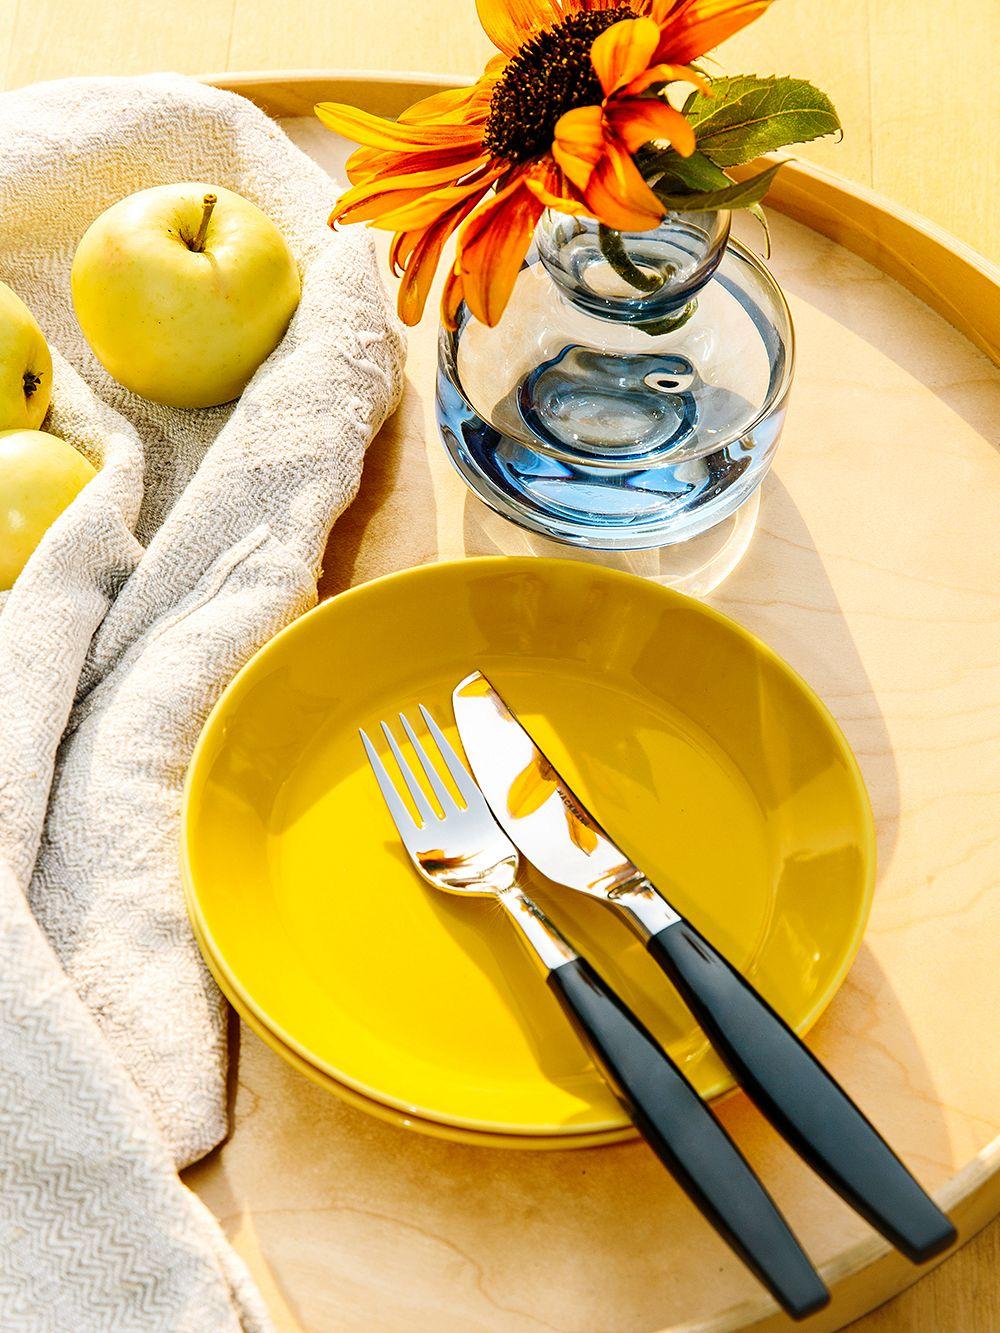 IIttala's Teema plate in honey yellow